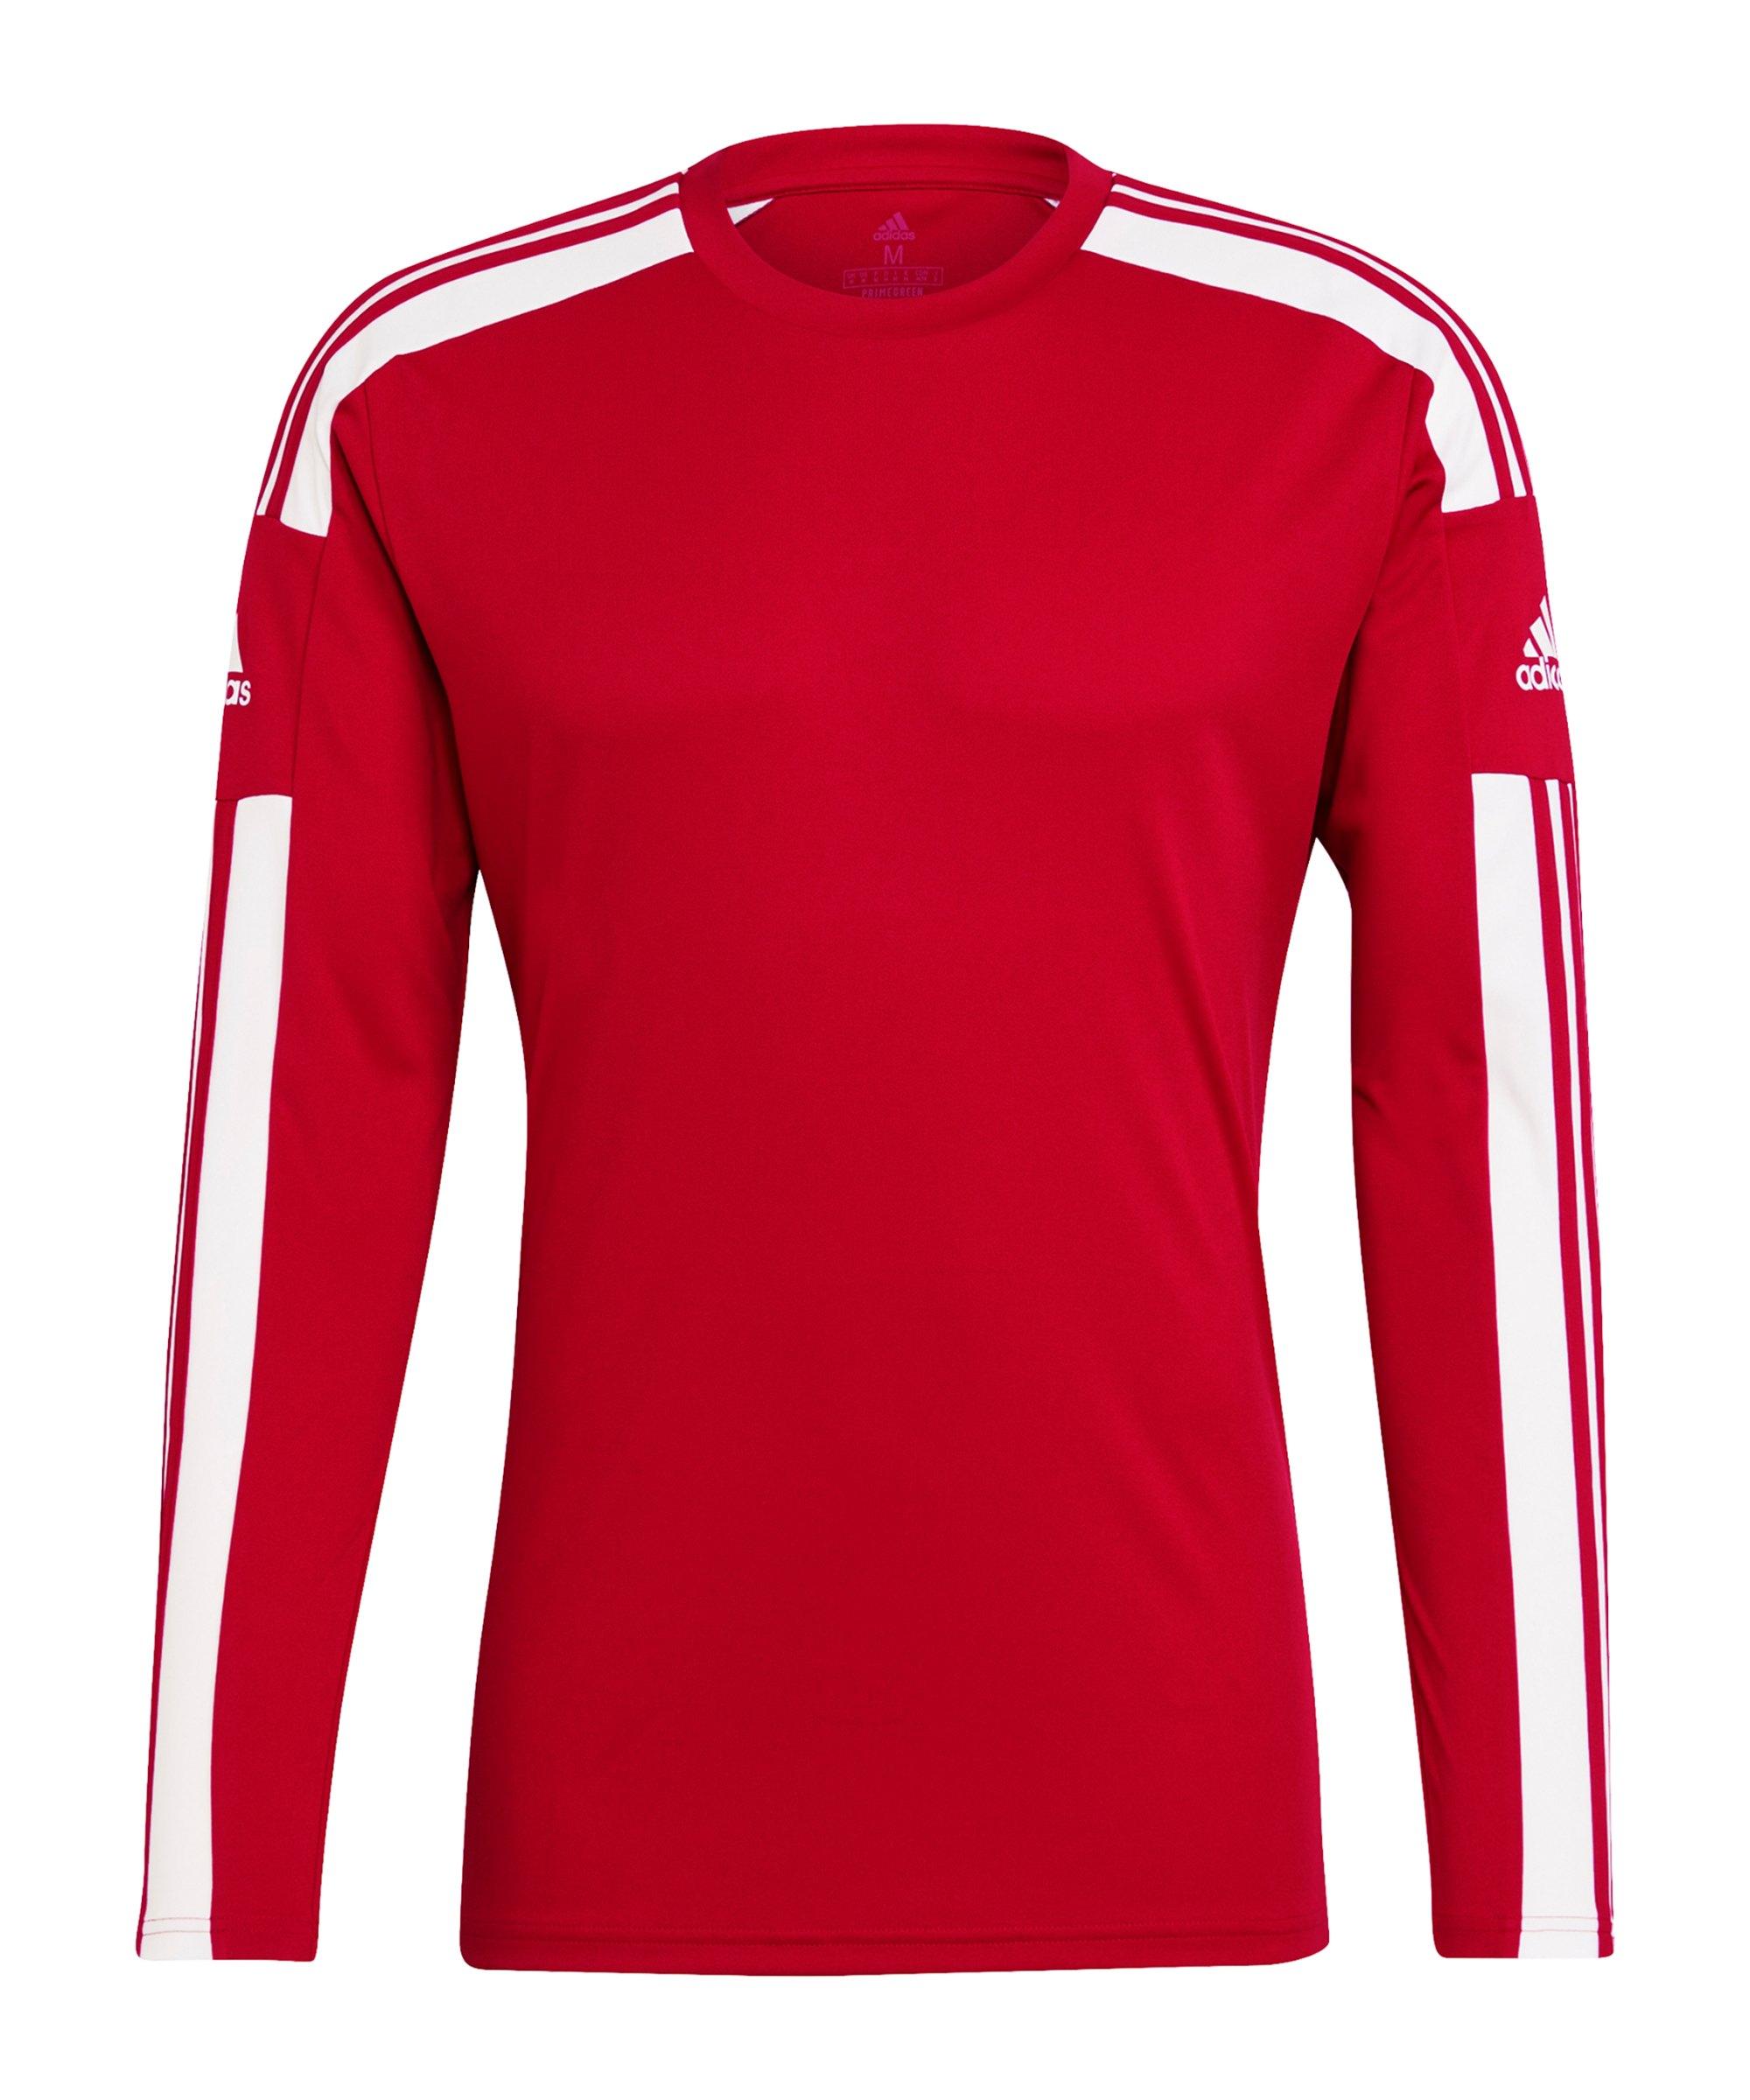 adidas Squadra 21 Trikot langarm Rot Weiss - rot